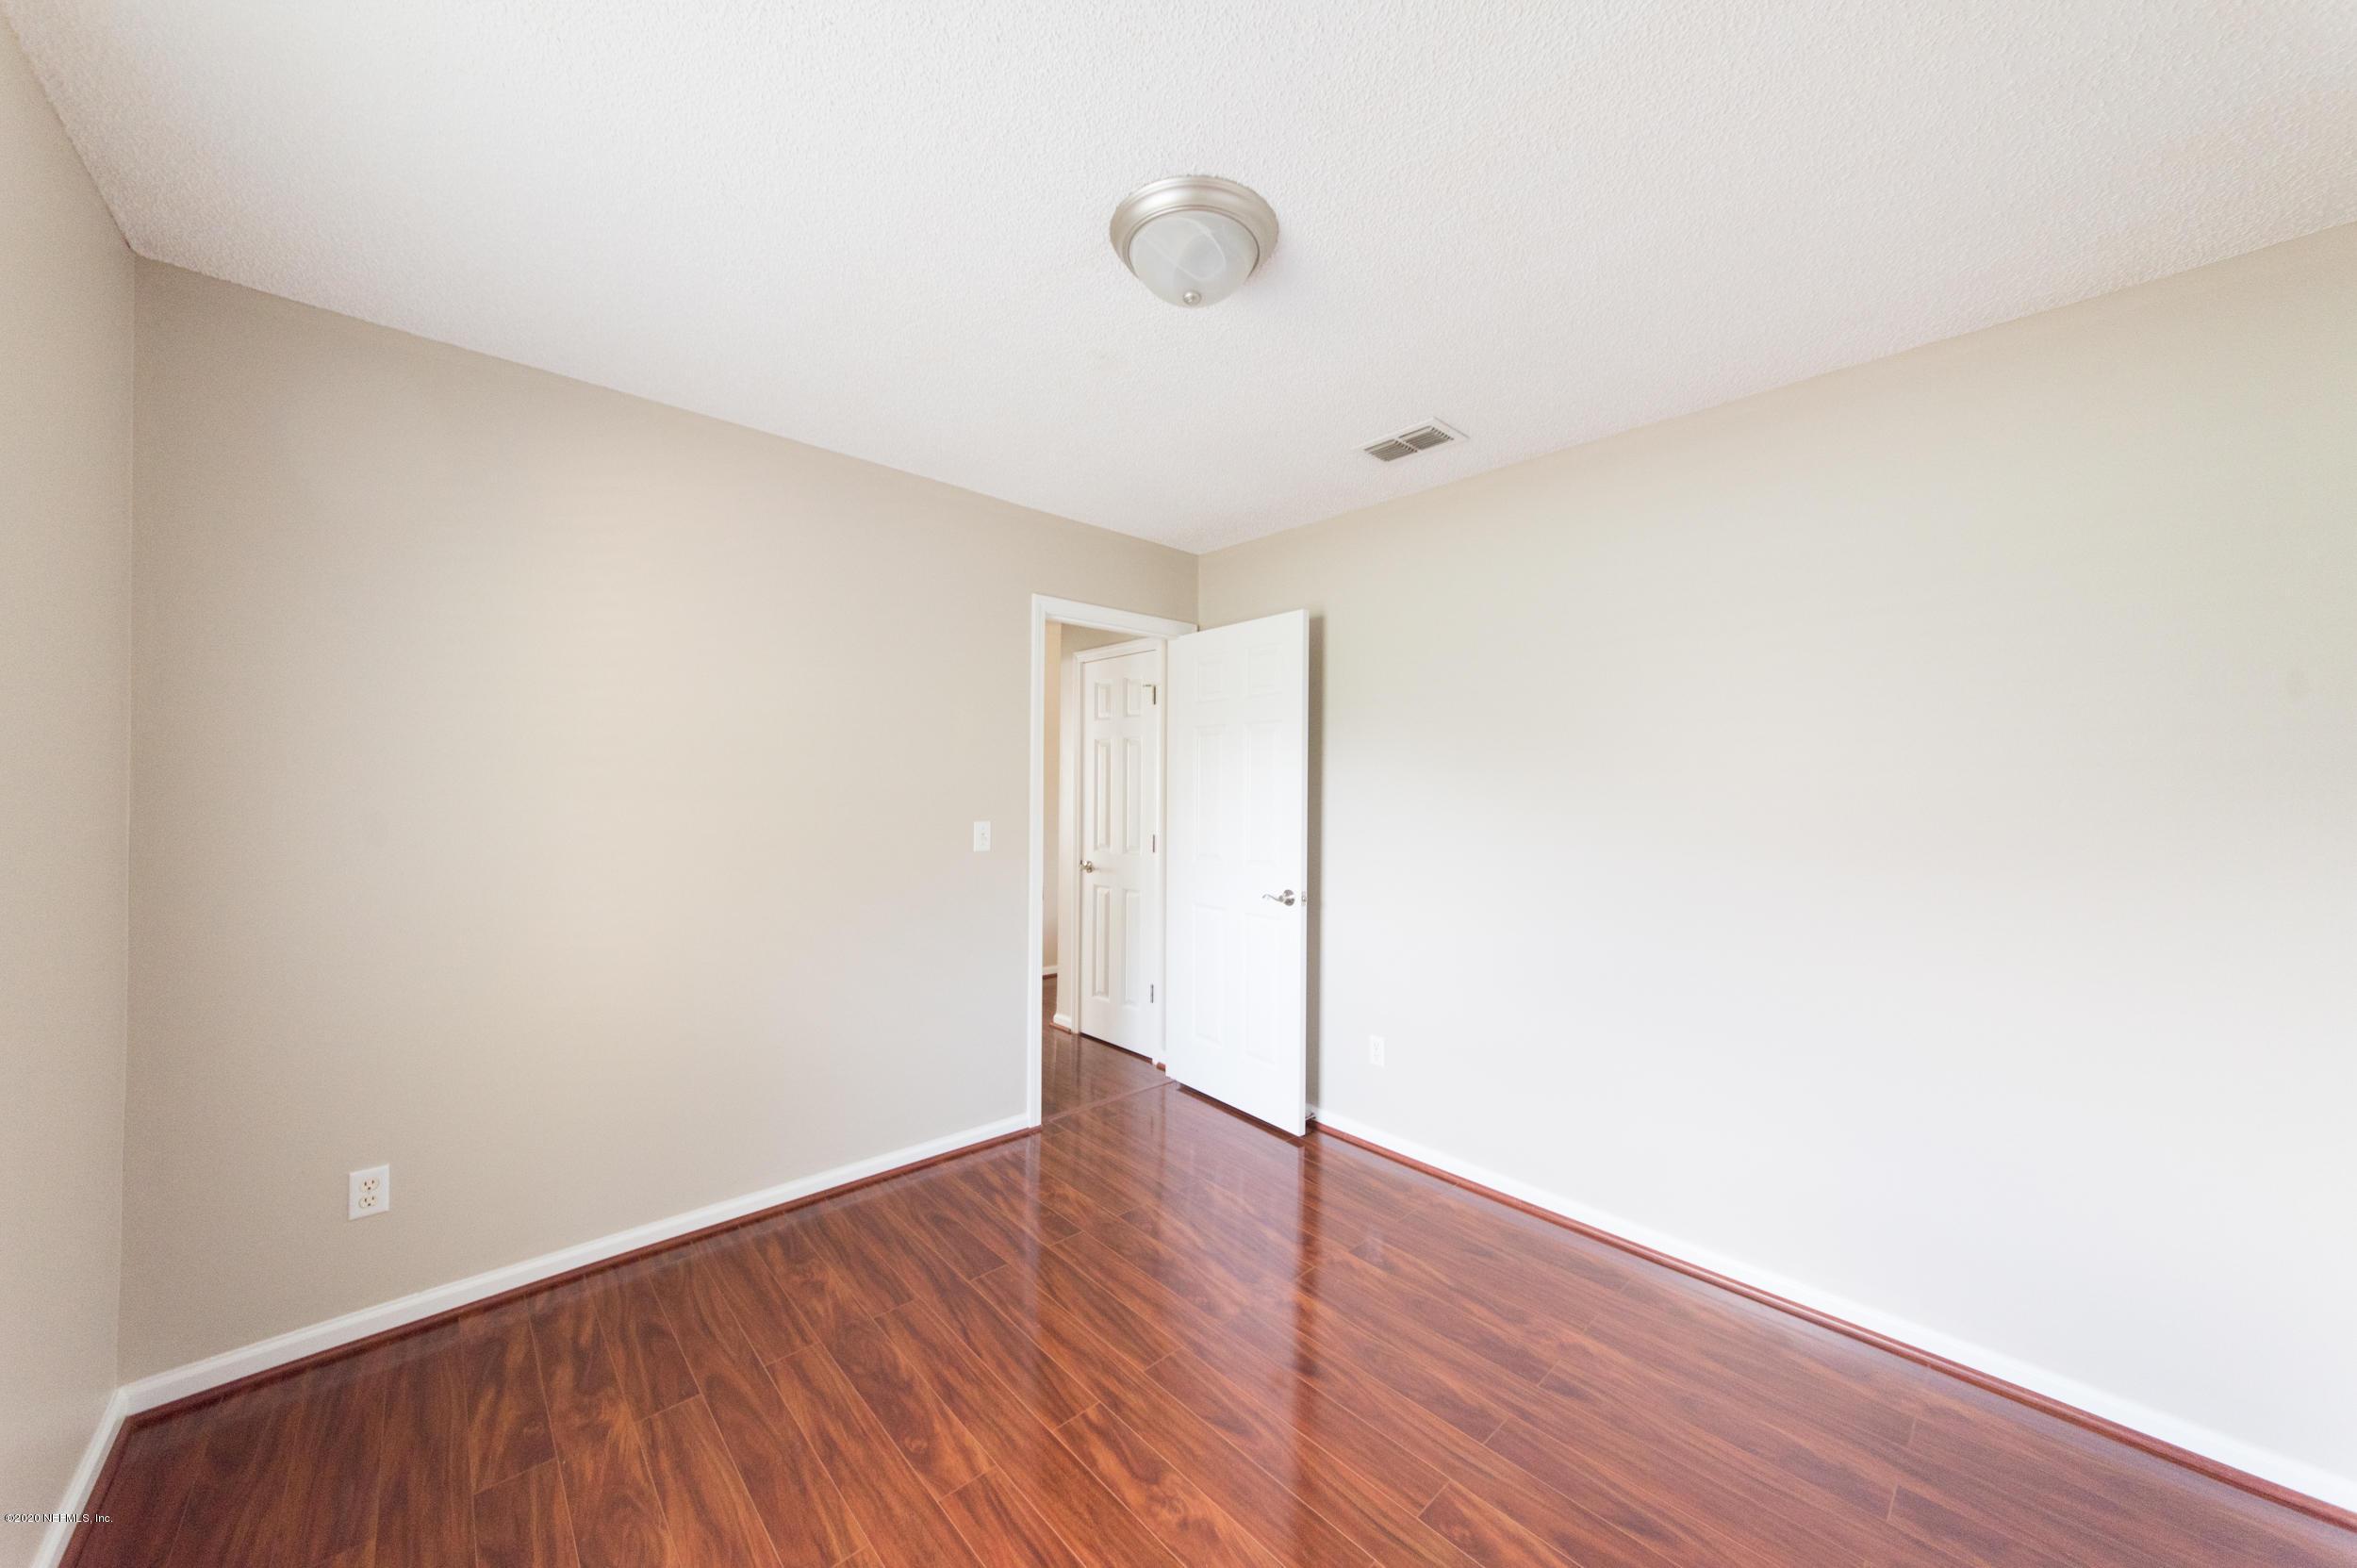 807 CAMP FRANCIS JOHNSON, ORANGE PARK, FLORIDA 32065, 4 Bedrooms Bedrooms, ,2 BathroomsBathrooms,Residential,For sale,CAMP FRANCIS JOHNSON,1083571